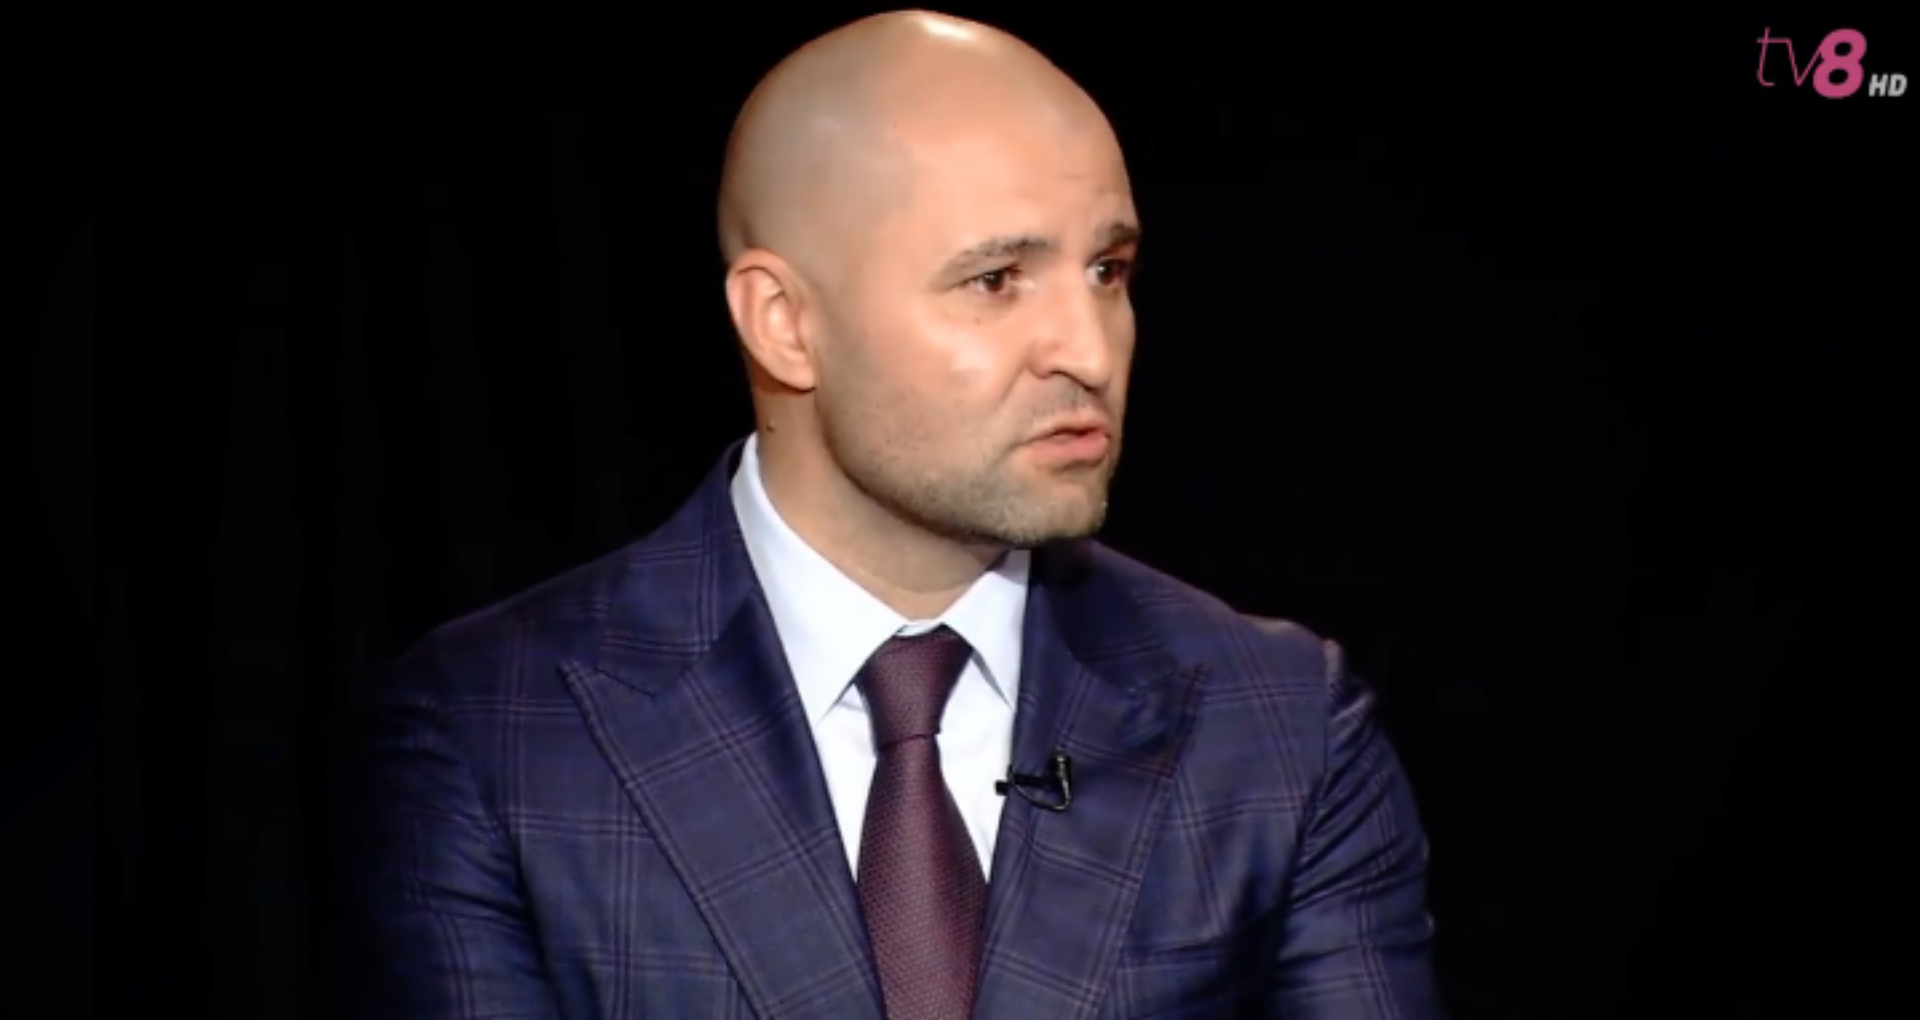 Vladimir Cebotari susține candidatura Maiei Sandu la prezidențiale. Mesajul transmis de deputatul PRO Moldova